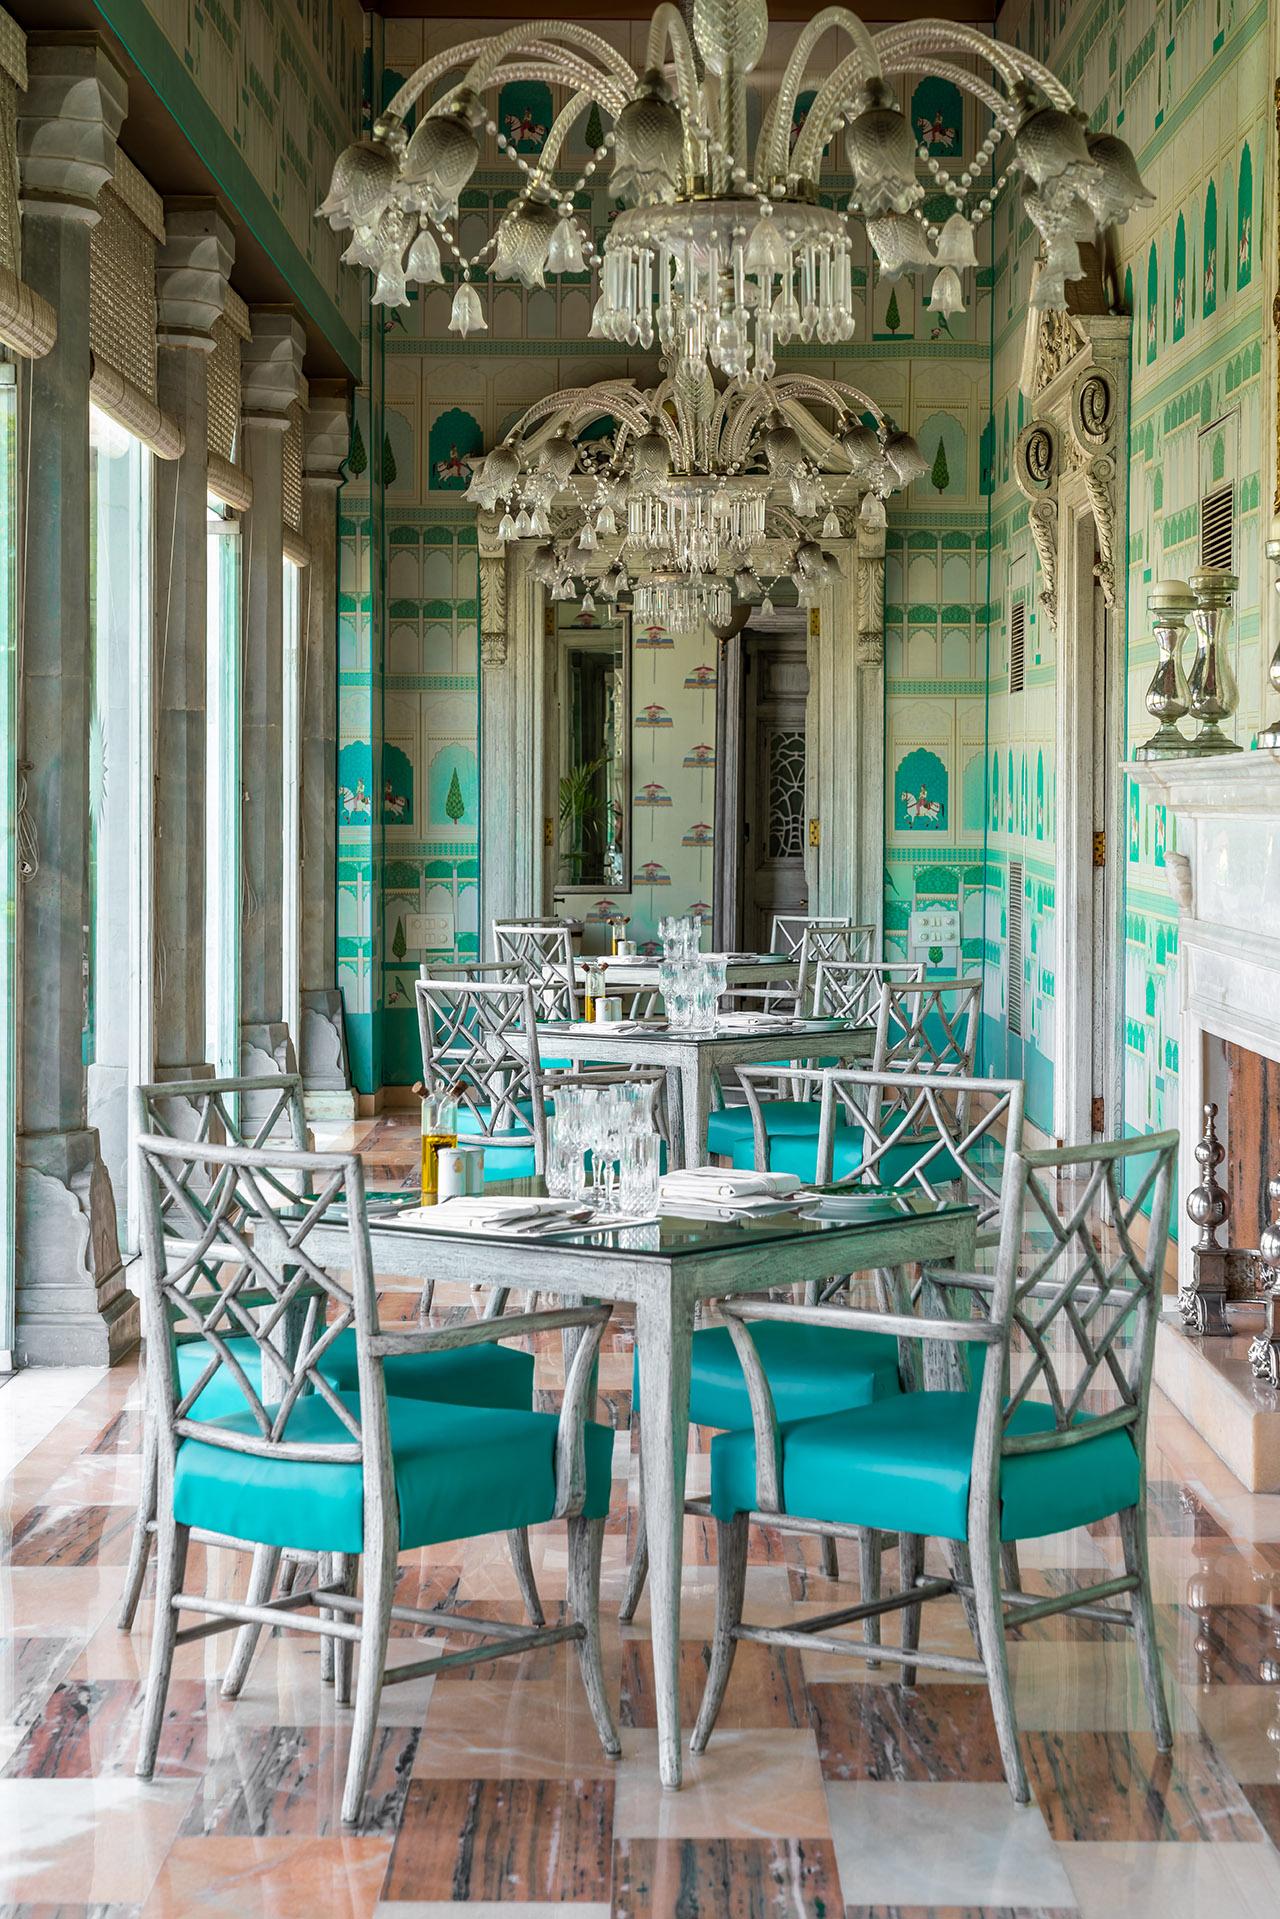 The Colonnade - Rajmahal Palace RAAS Jaipur x AG